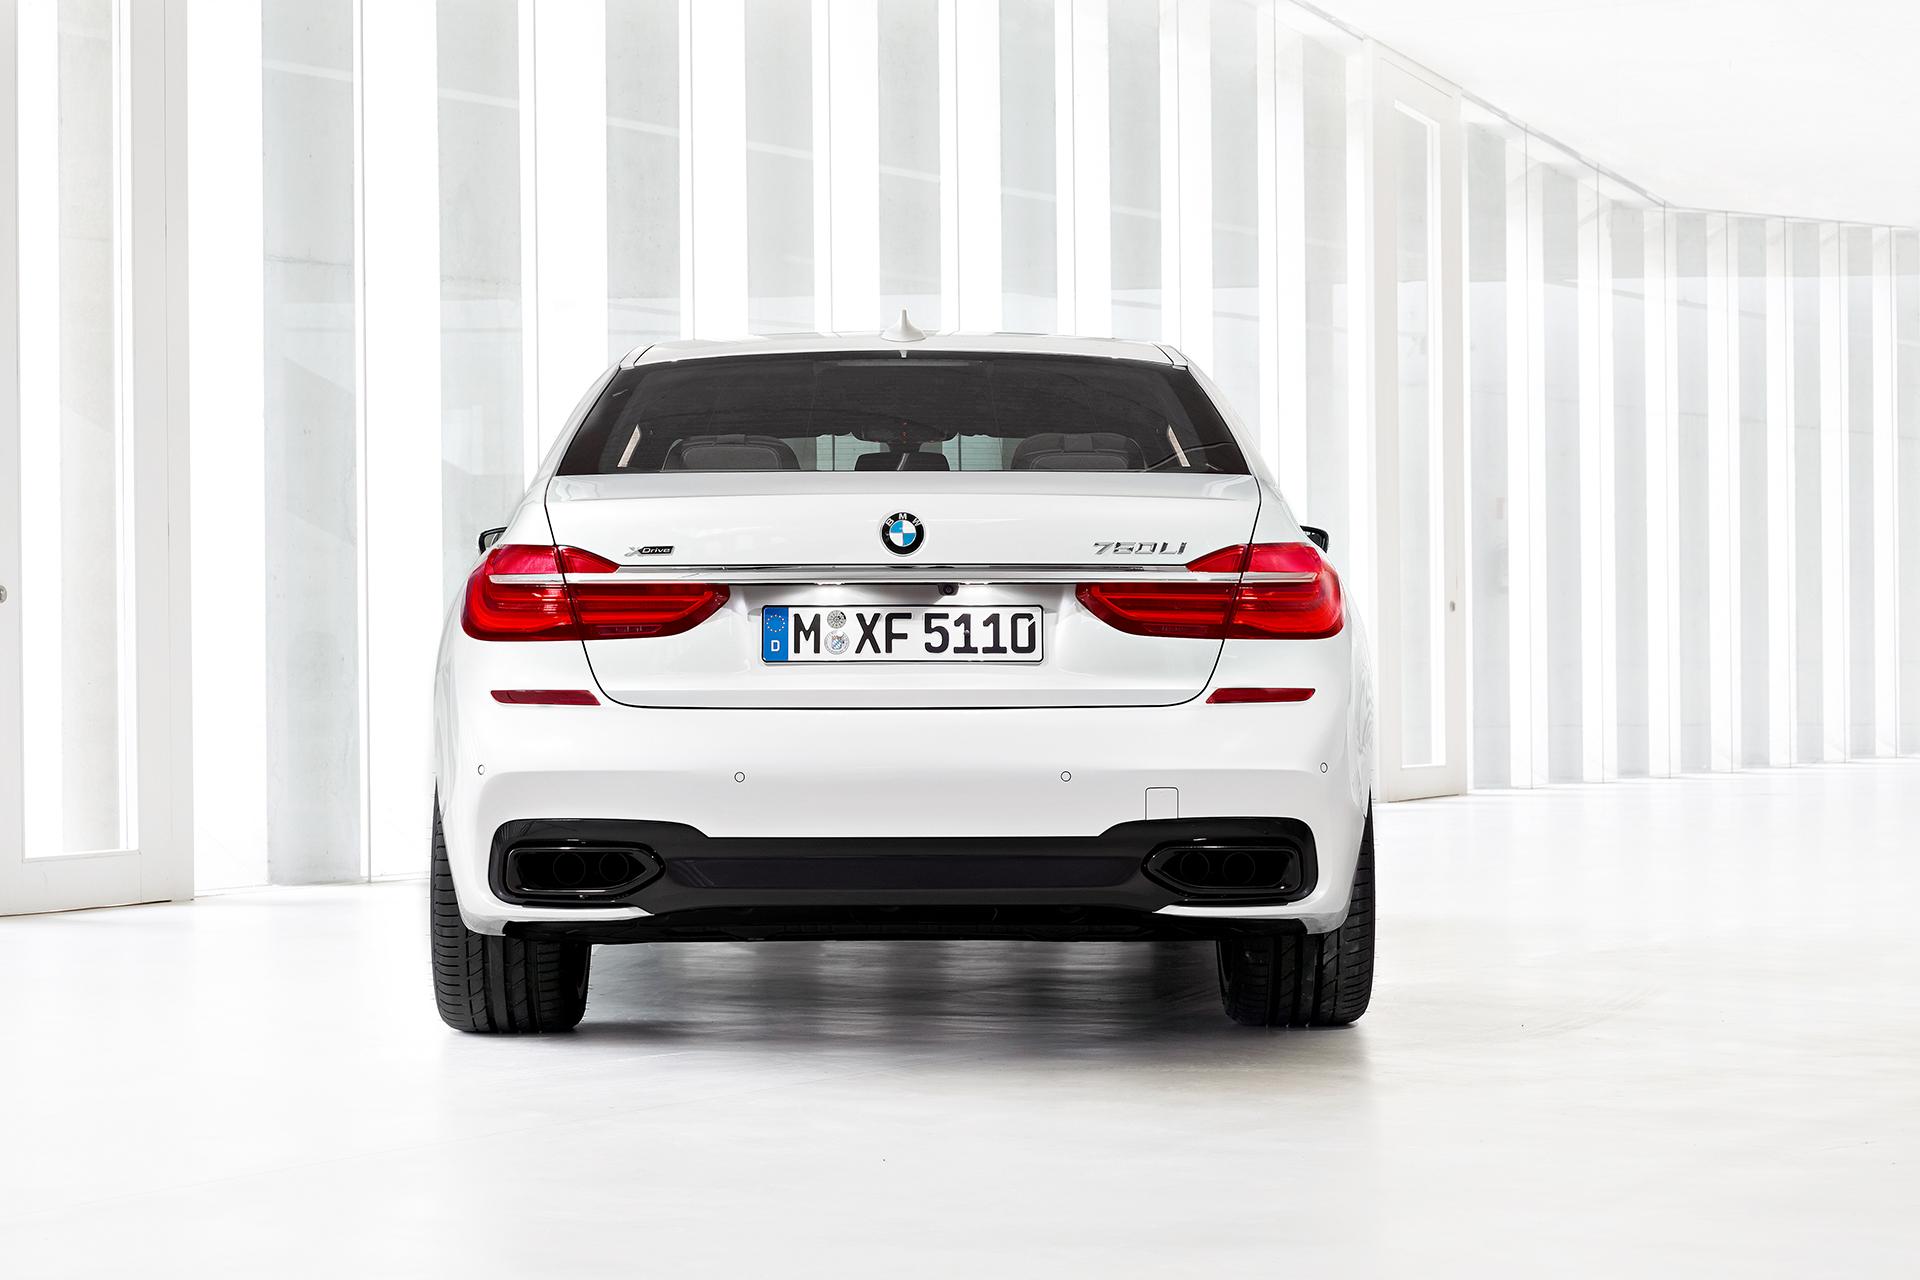 BMW 7 series - 2016 - arrière / rear